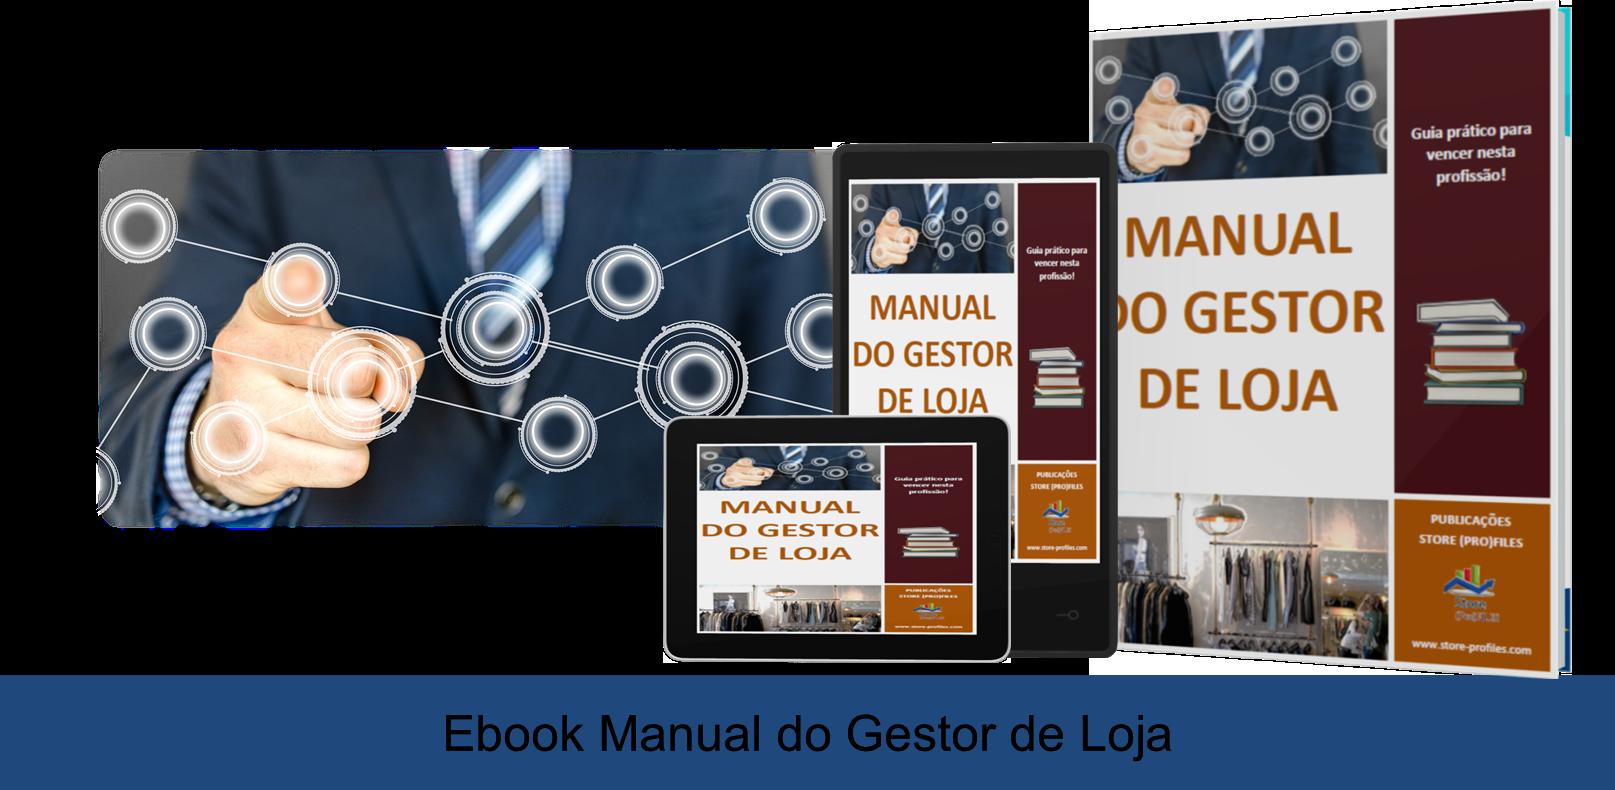 Capa site Ebook Manual do Gestor de Loja